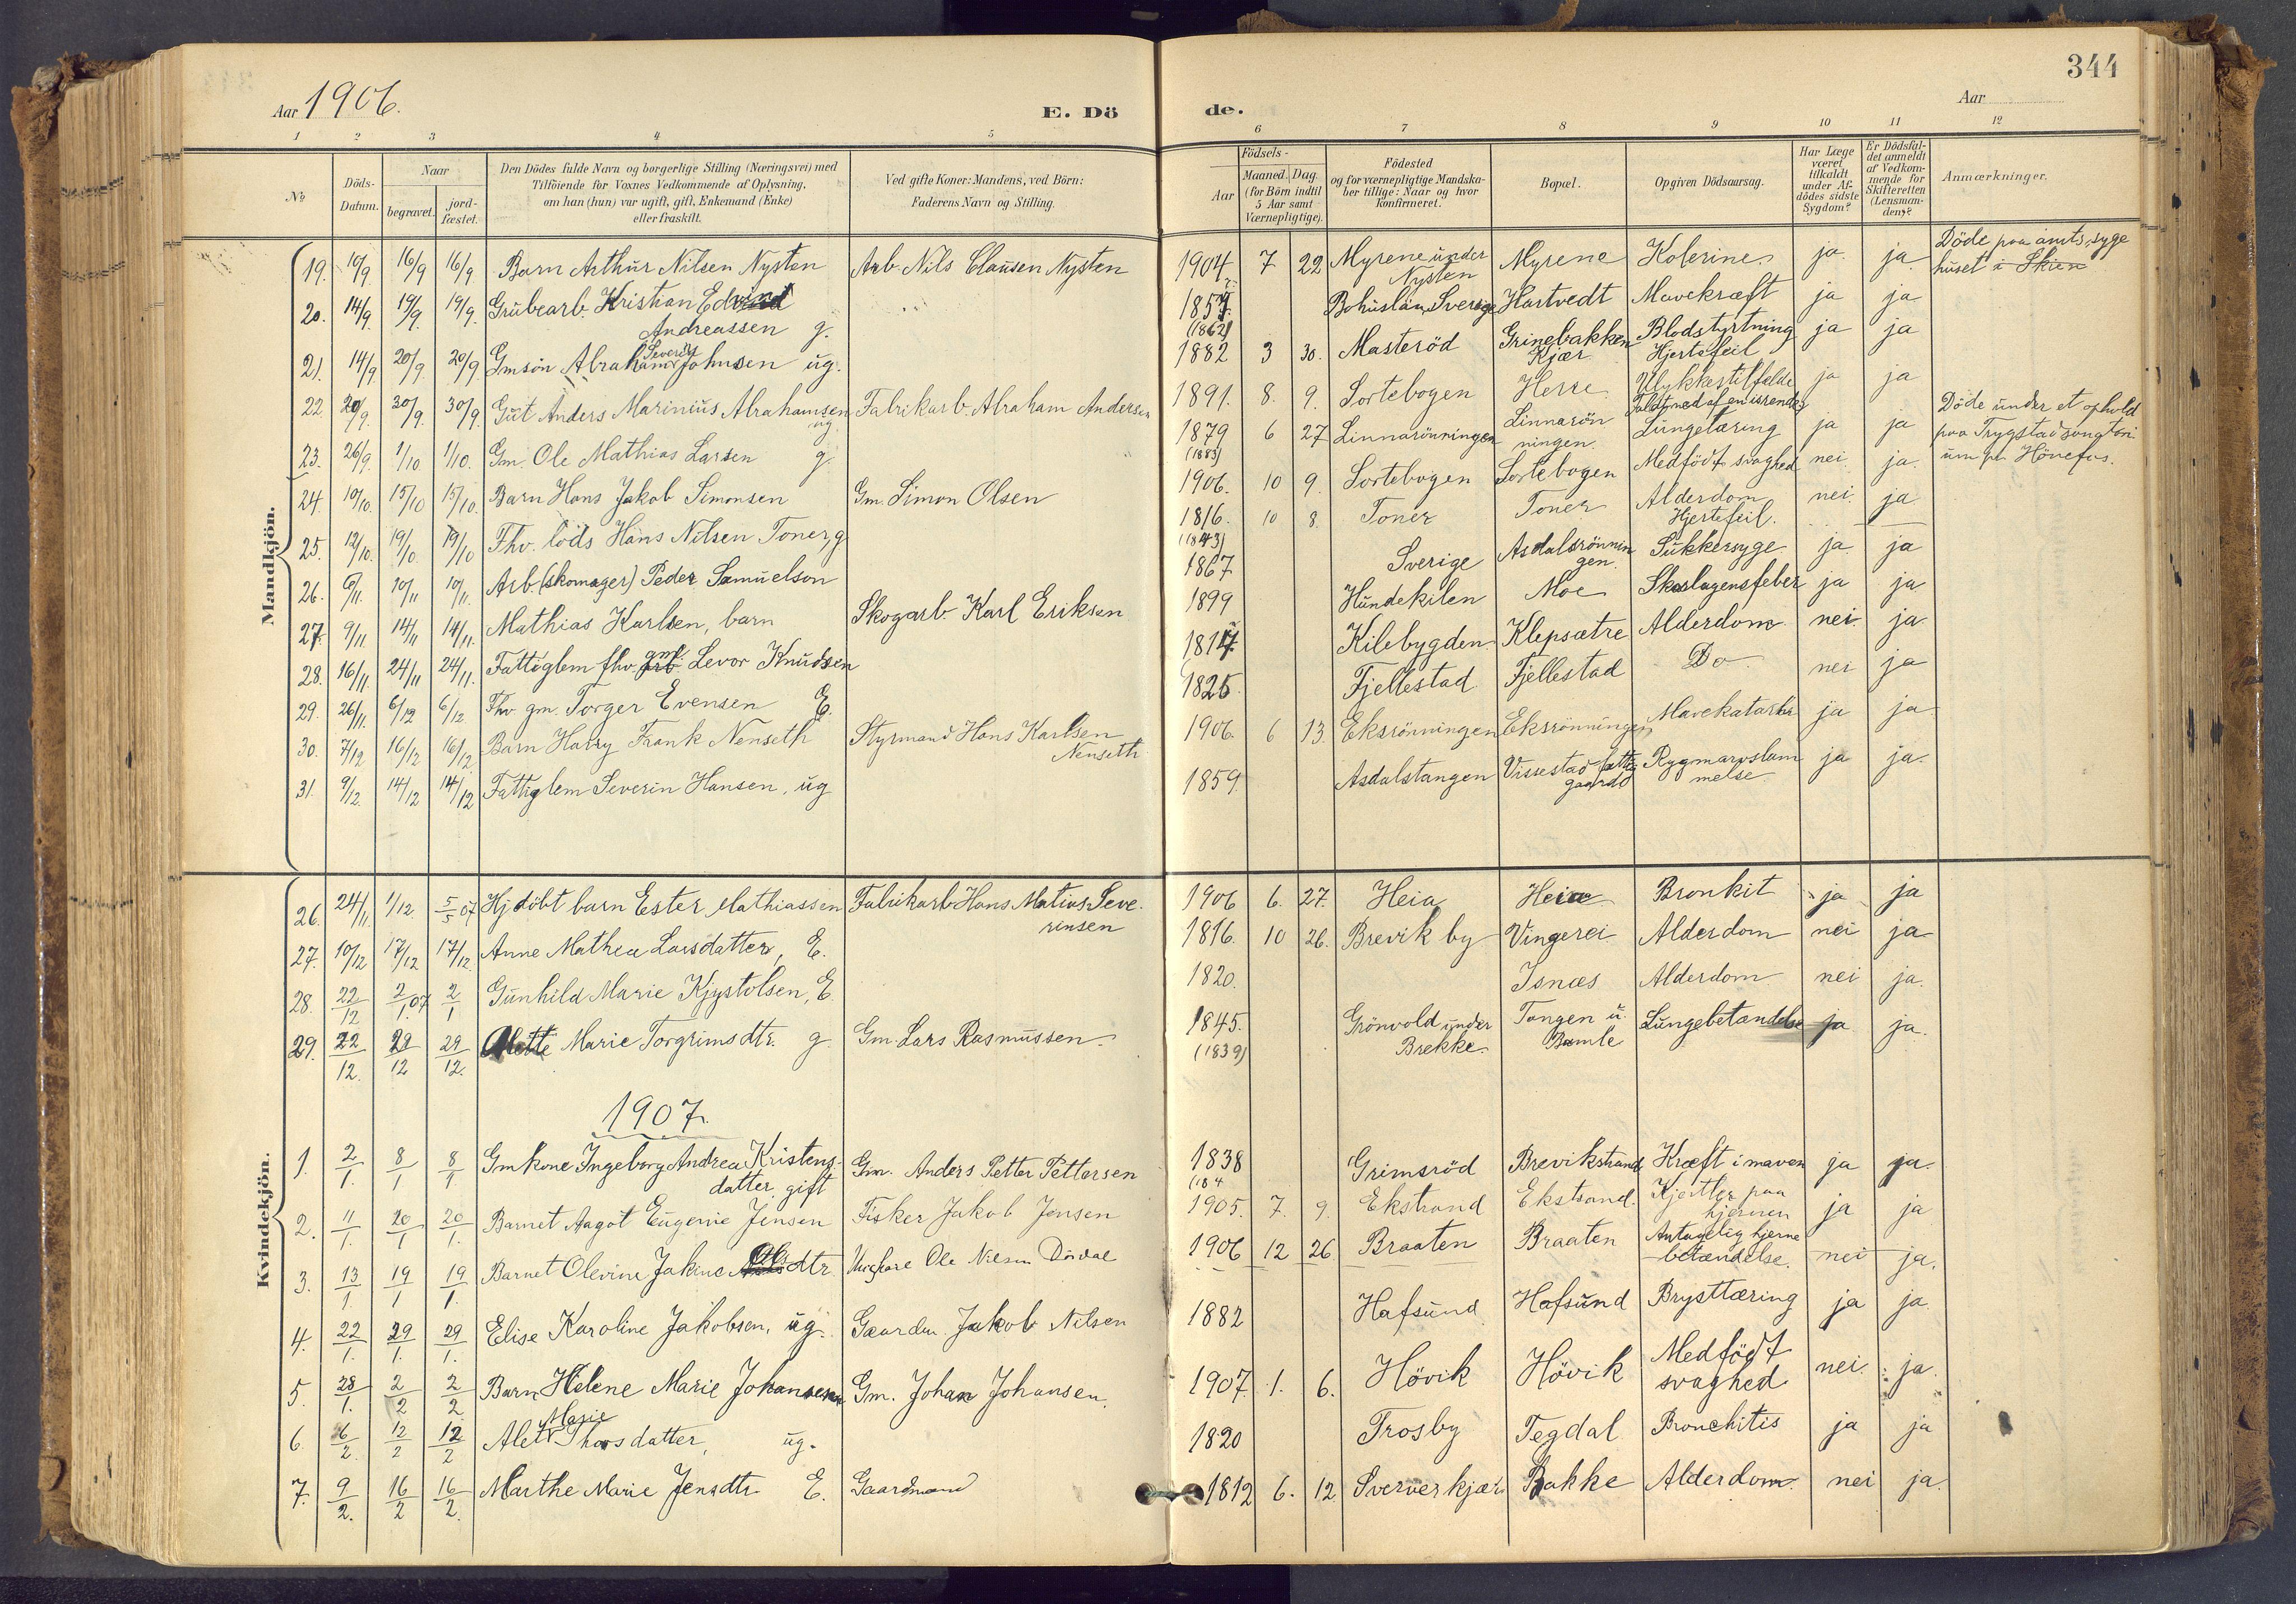 SAKO, Bamble kirkebøker, F/Fa/L0009: Ministerialbok nr. I 9, 1901-1917, s. 344